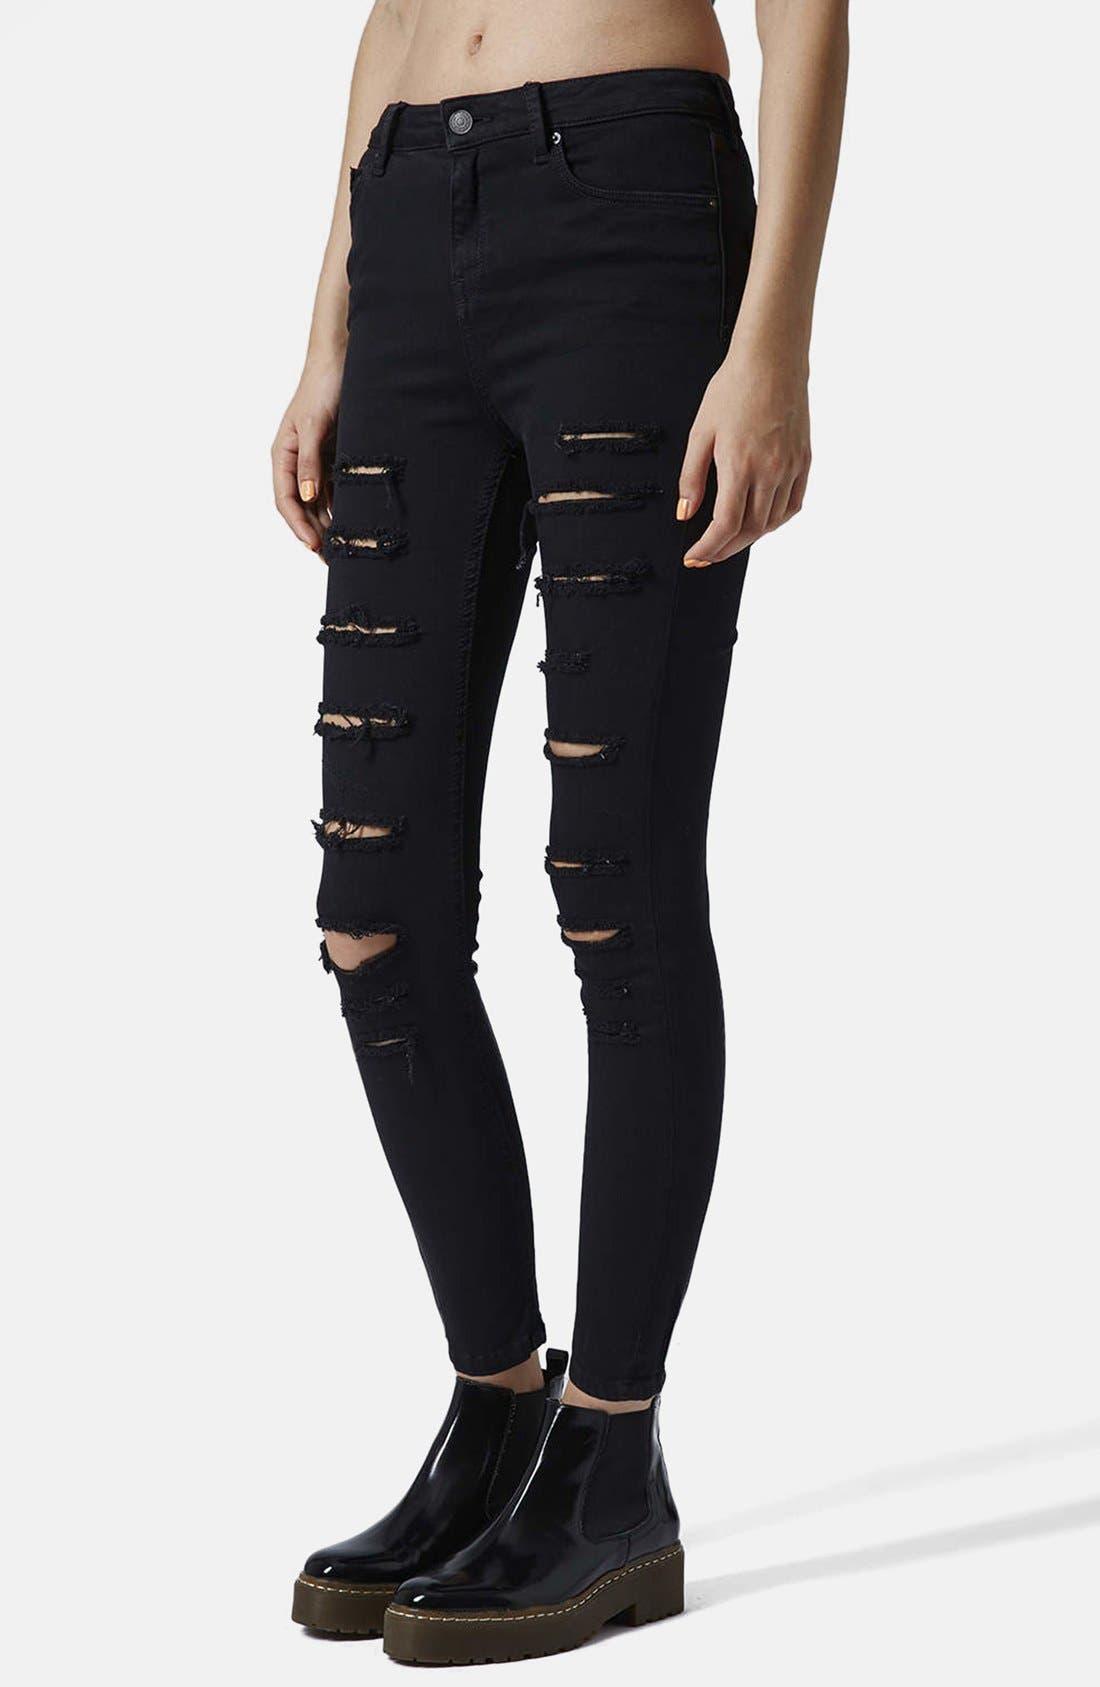 Alternate Image 1 Selected - Topshop 'Jamie' Distressed Skinny Jeans (Regular & Short)